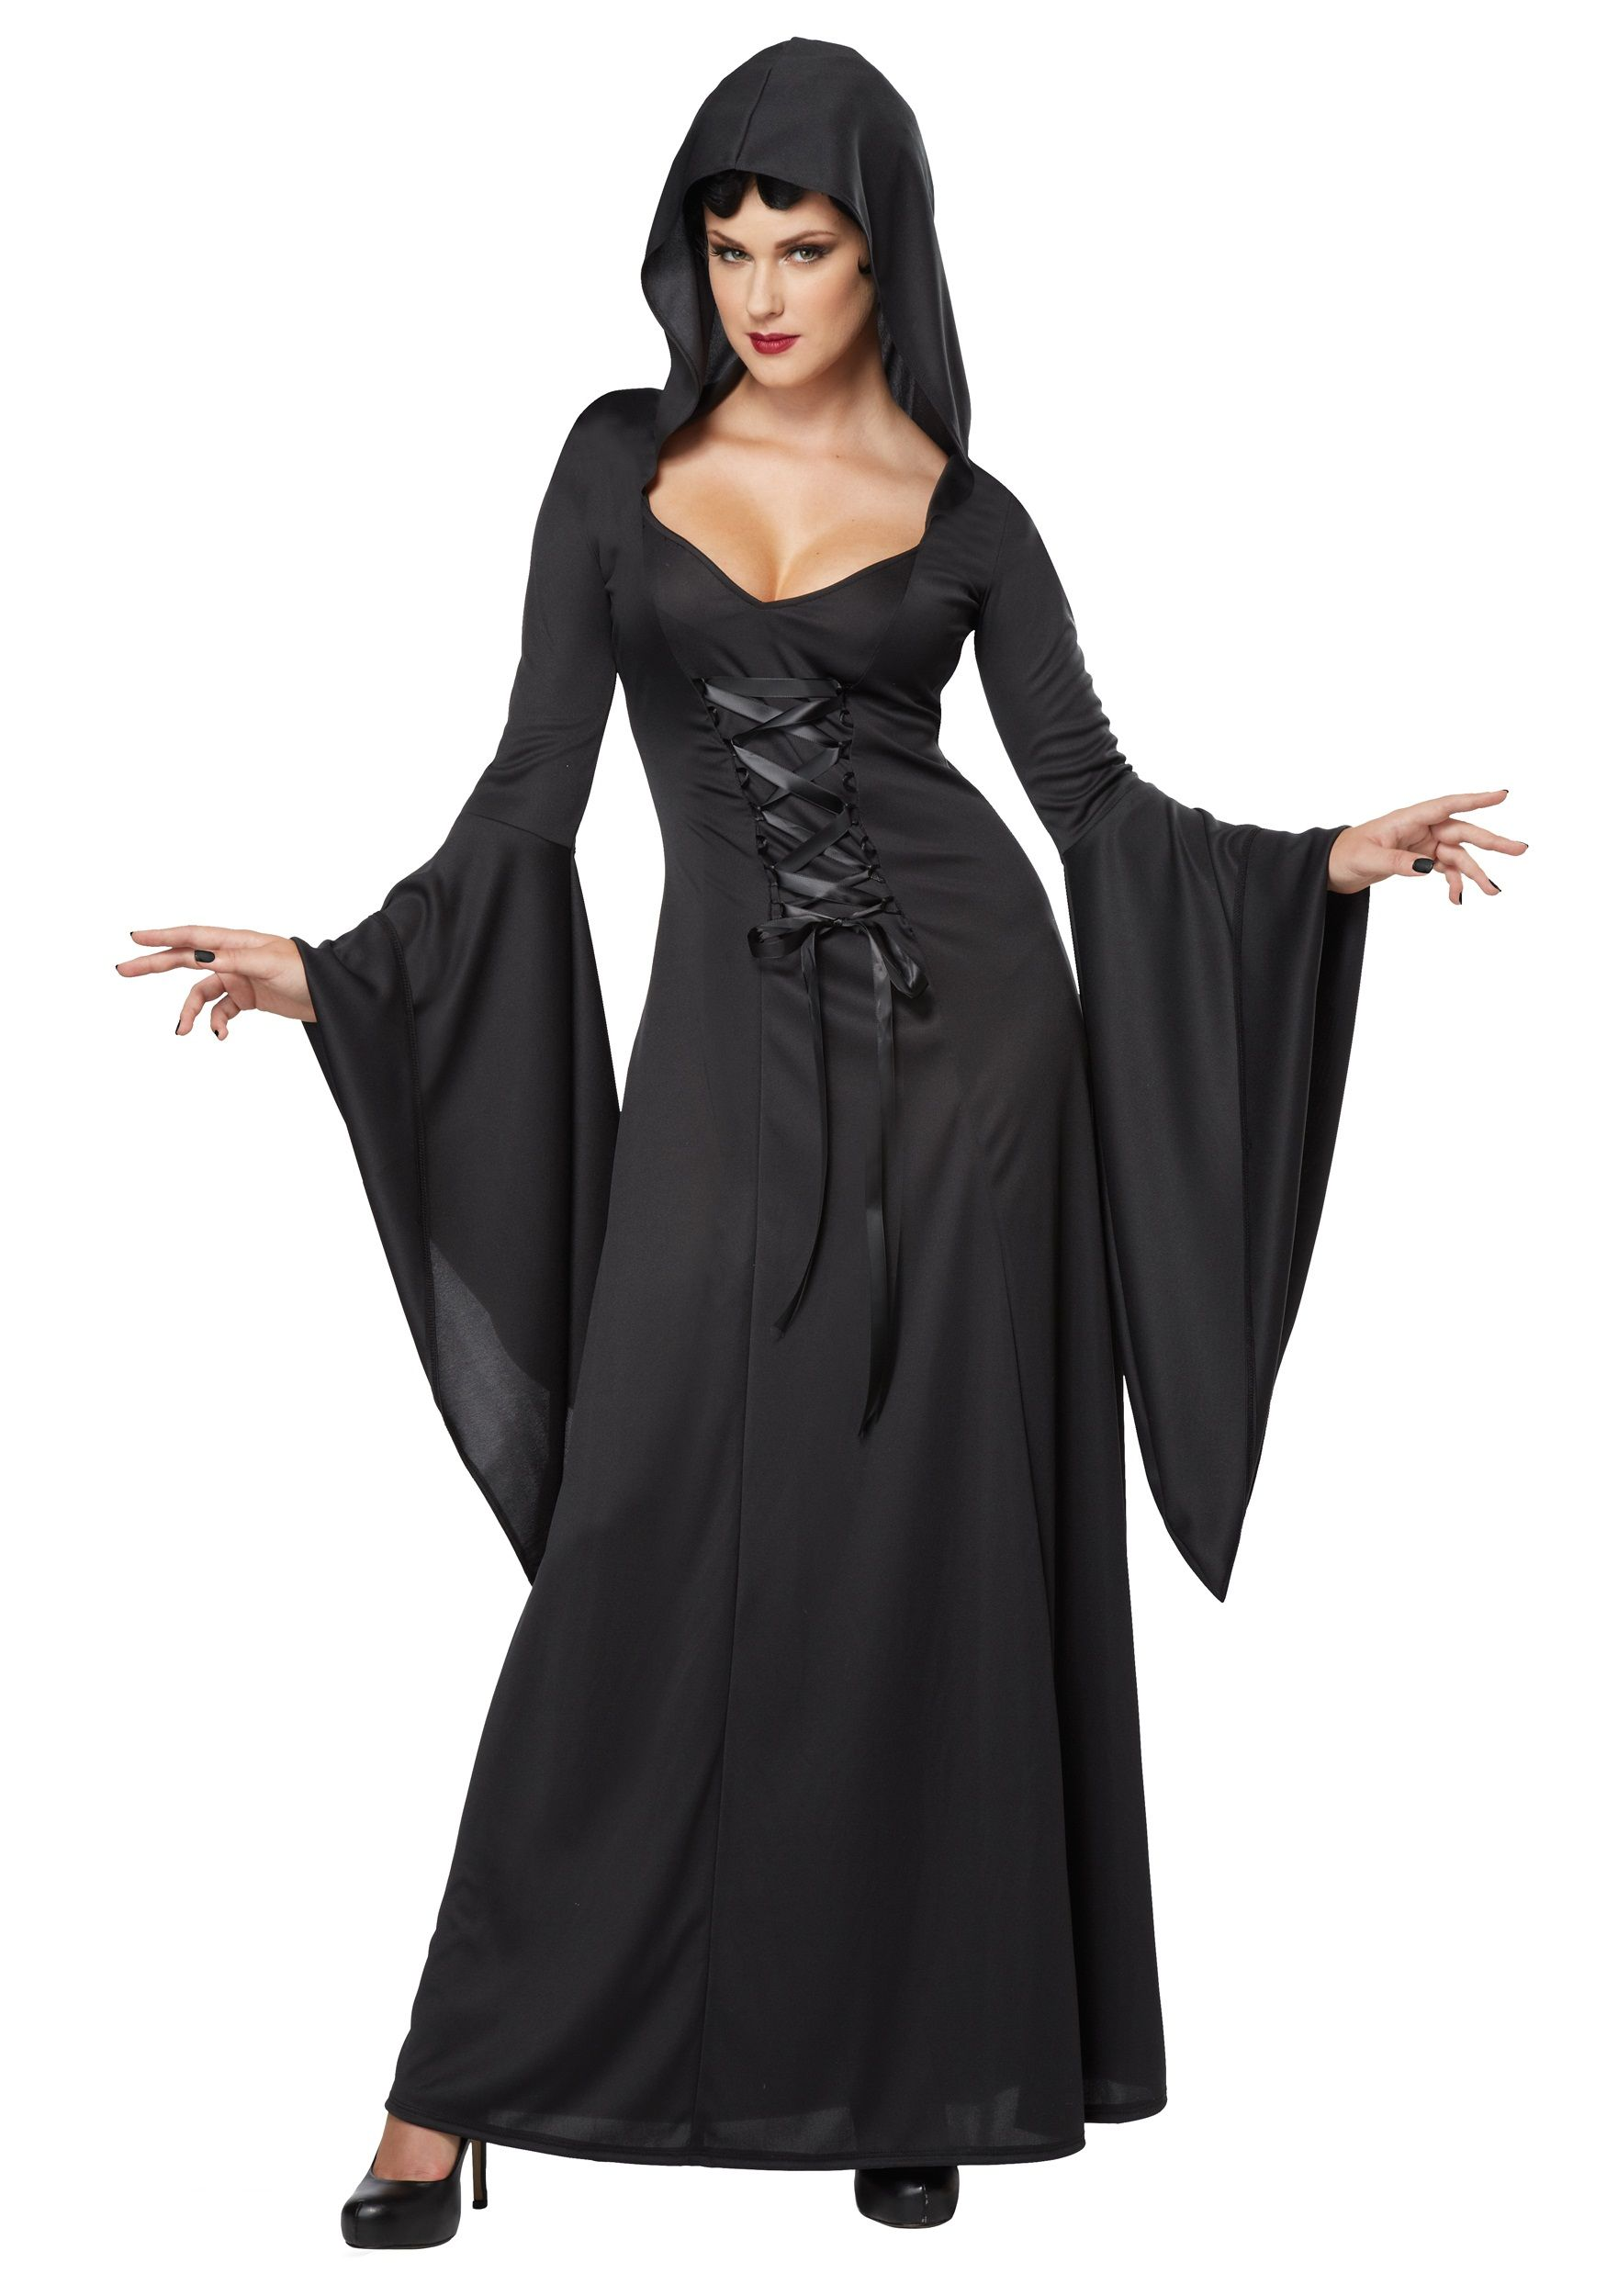 Black Brand New Deluxe Hooded Robe Vampire Adult Costume